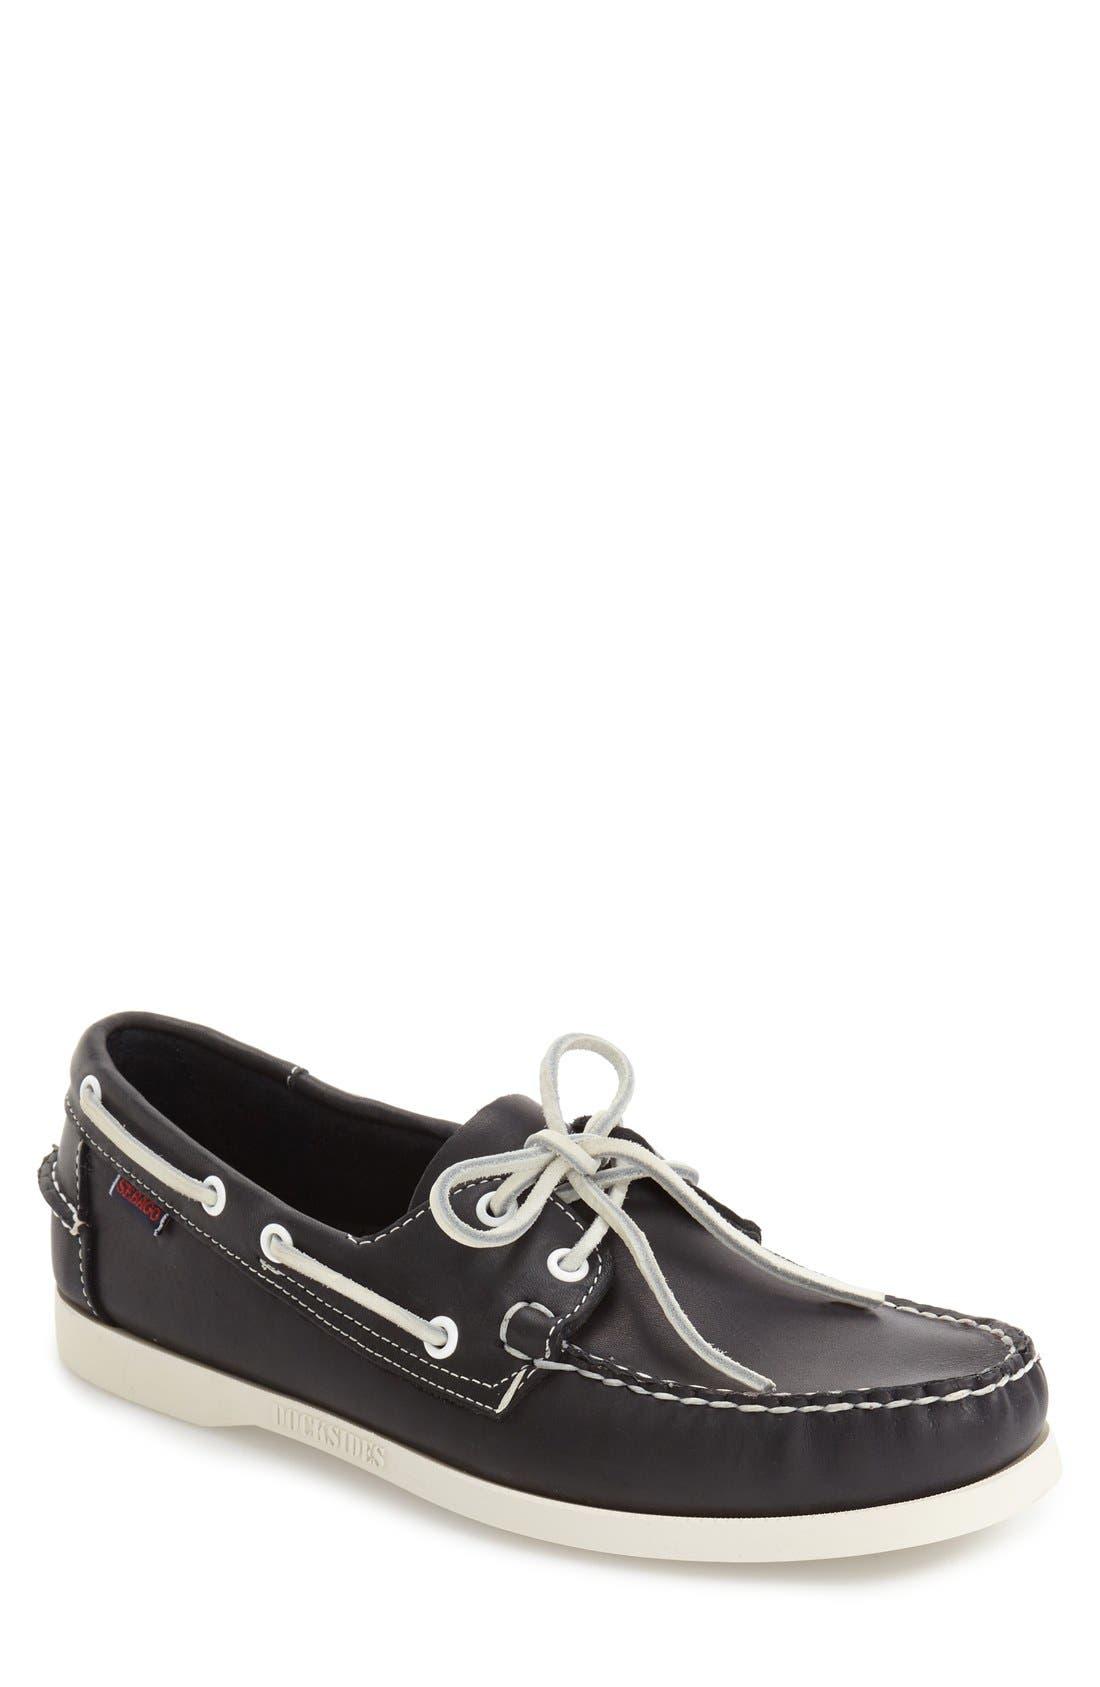 Main Image - Sebago 'Docksides®' Boat Shoe